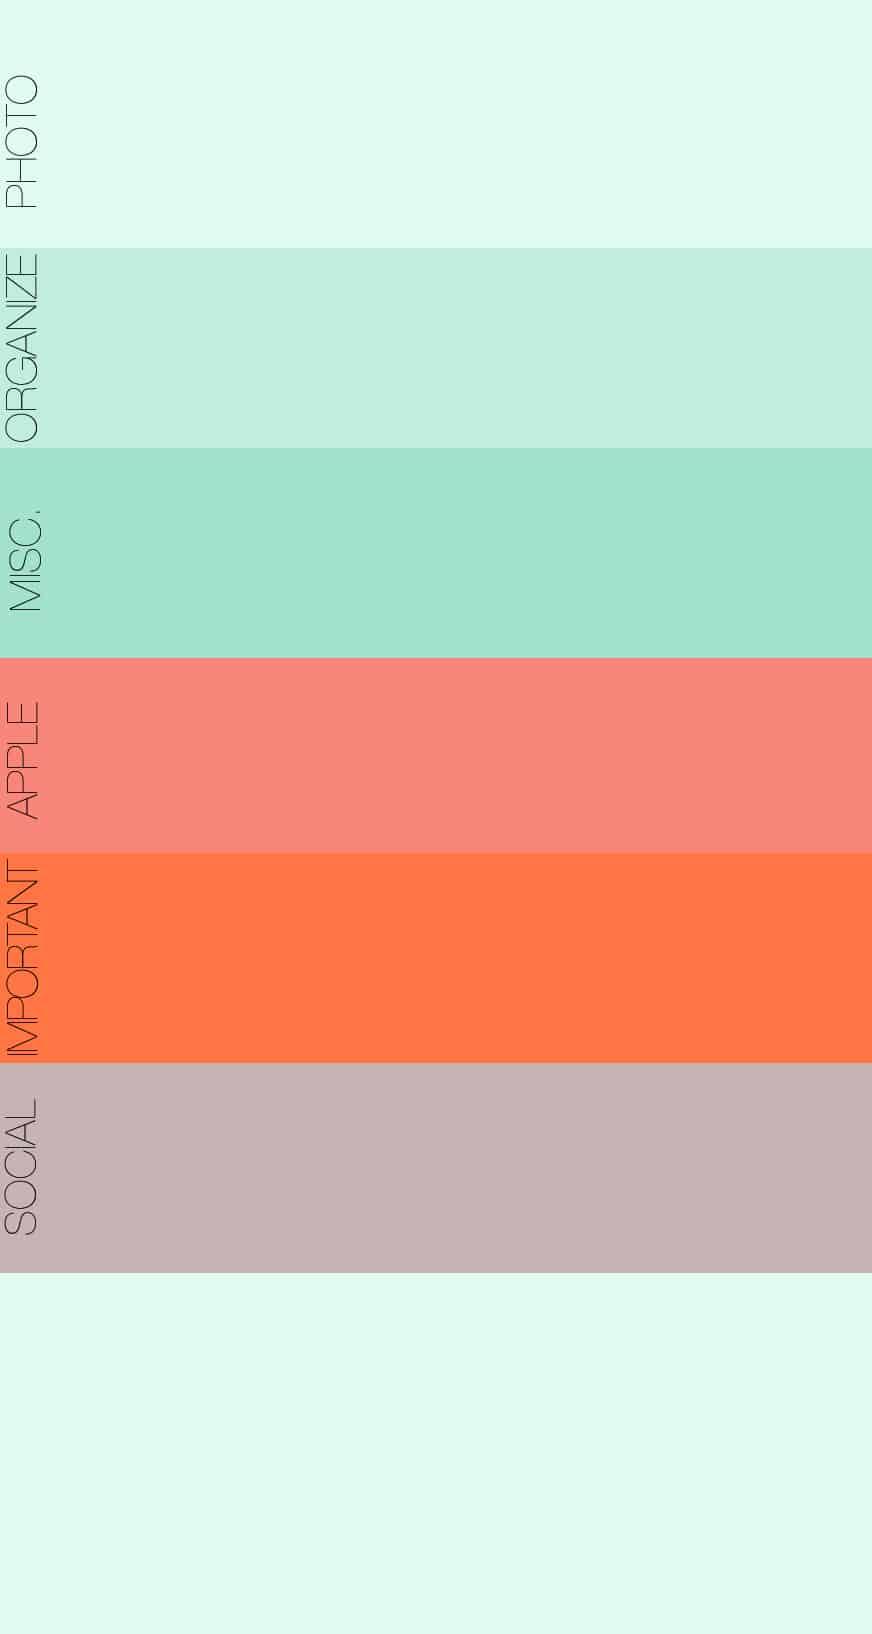 iphone6_organizer_tourq_orange_TEXT